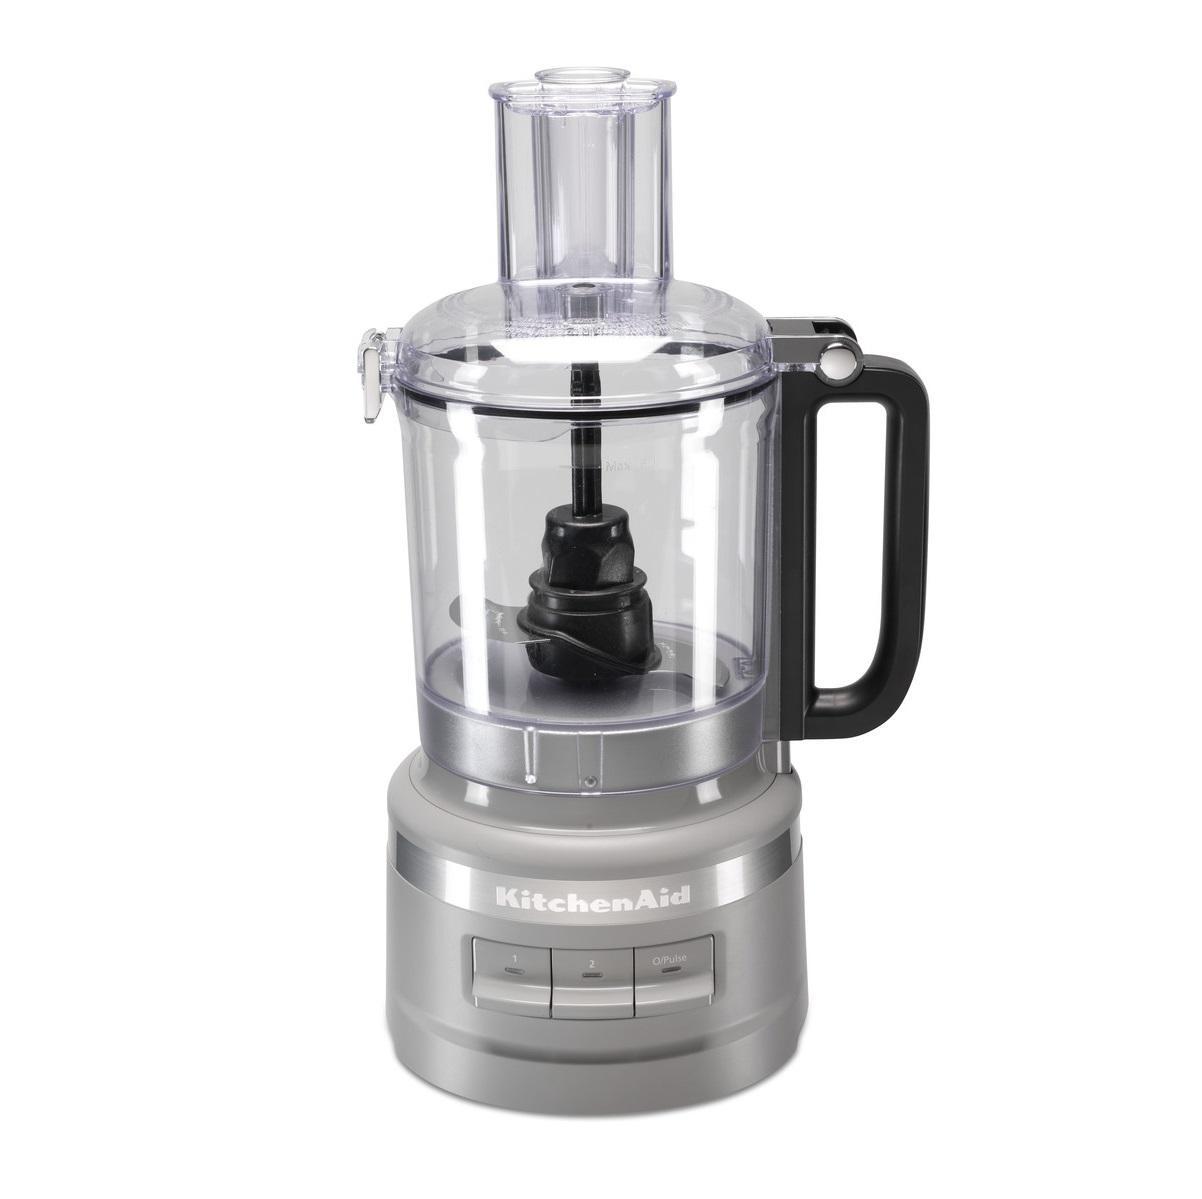 KitchenAid® 9-Cup Food Processor, Silver